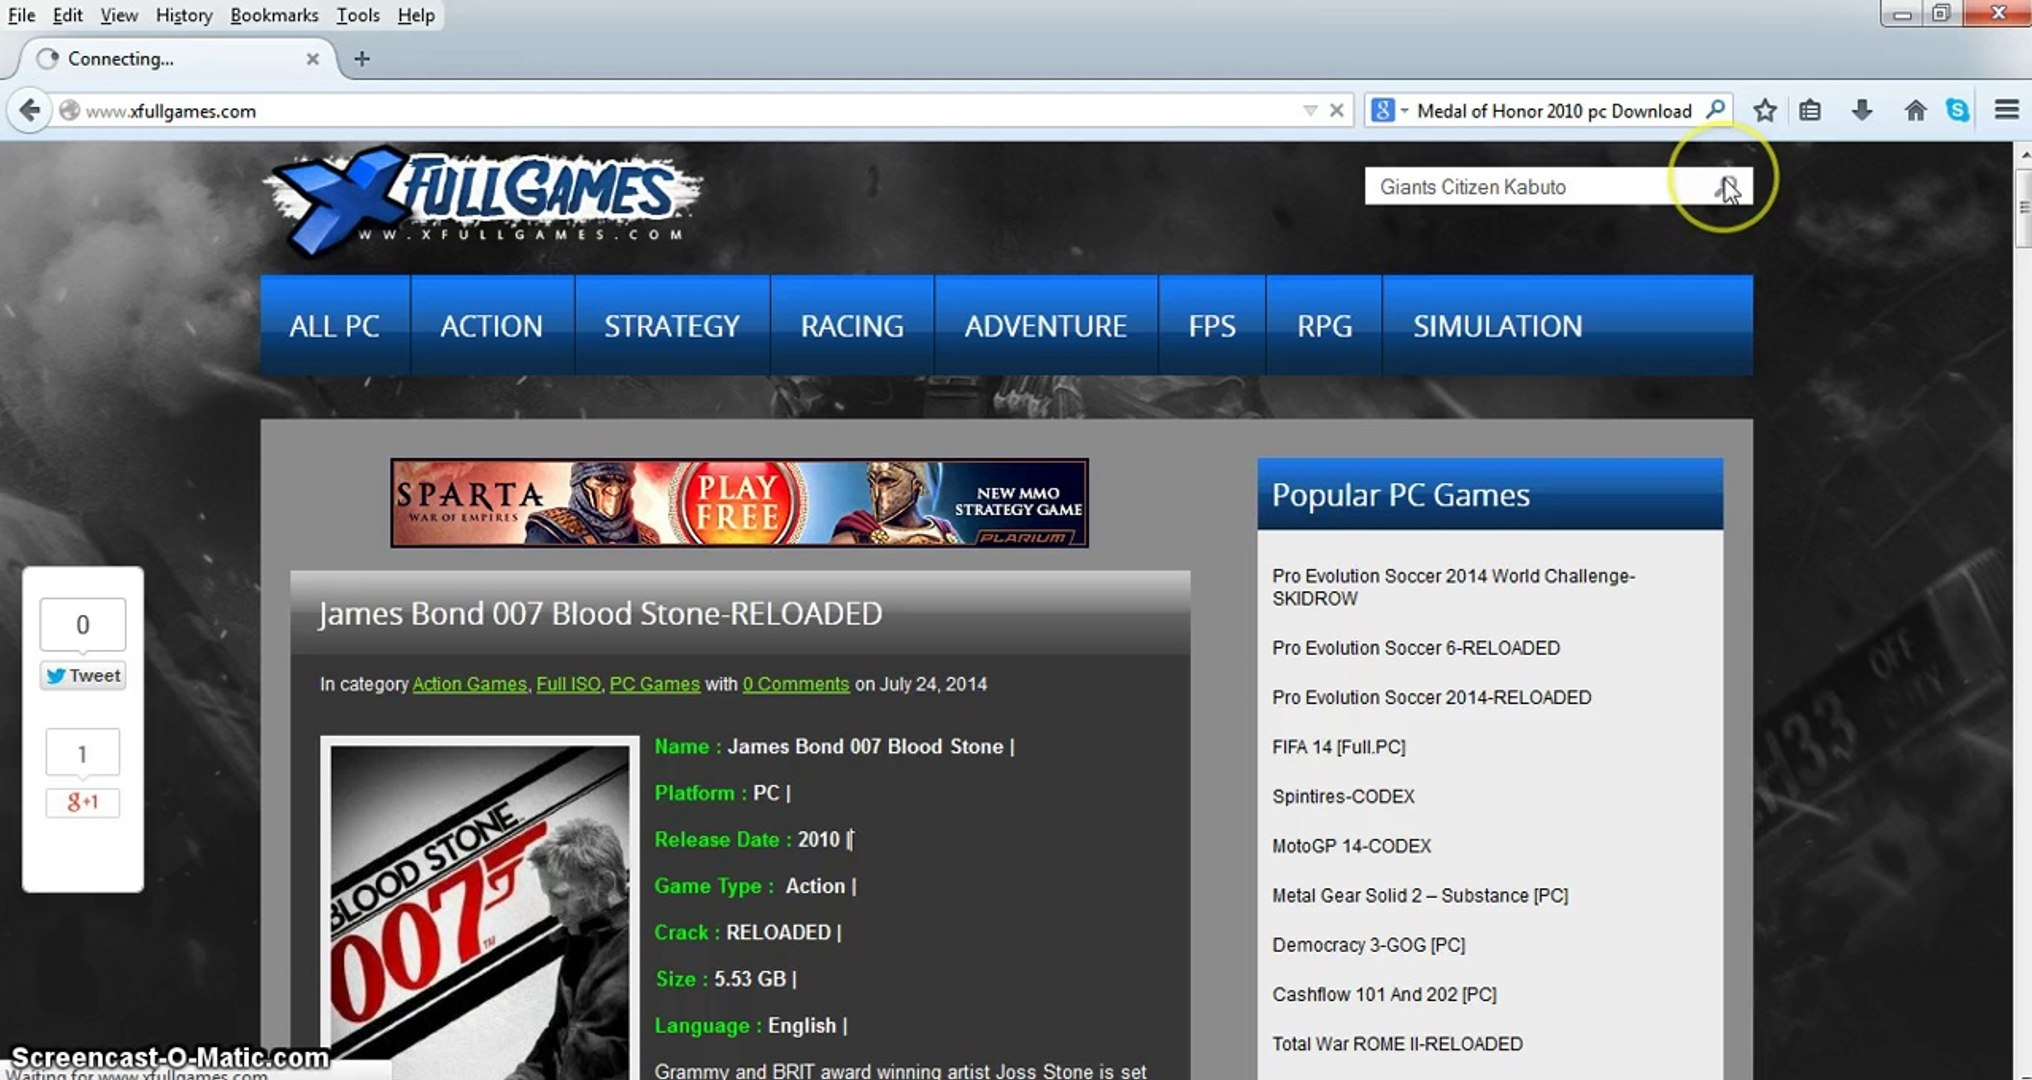 Free Download Giants Citizen Kabuto Game Full PC